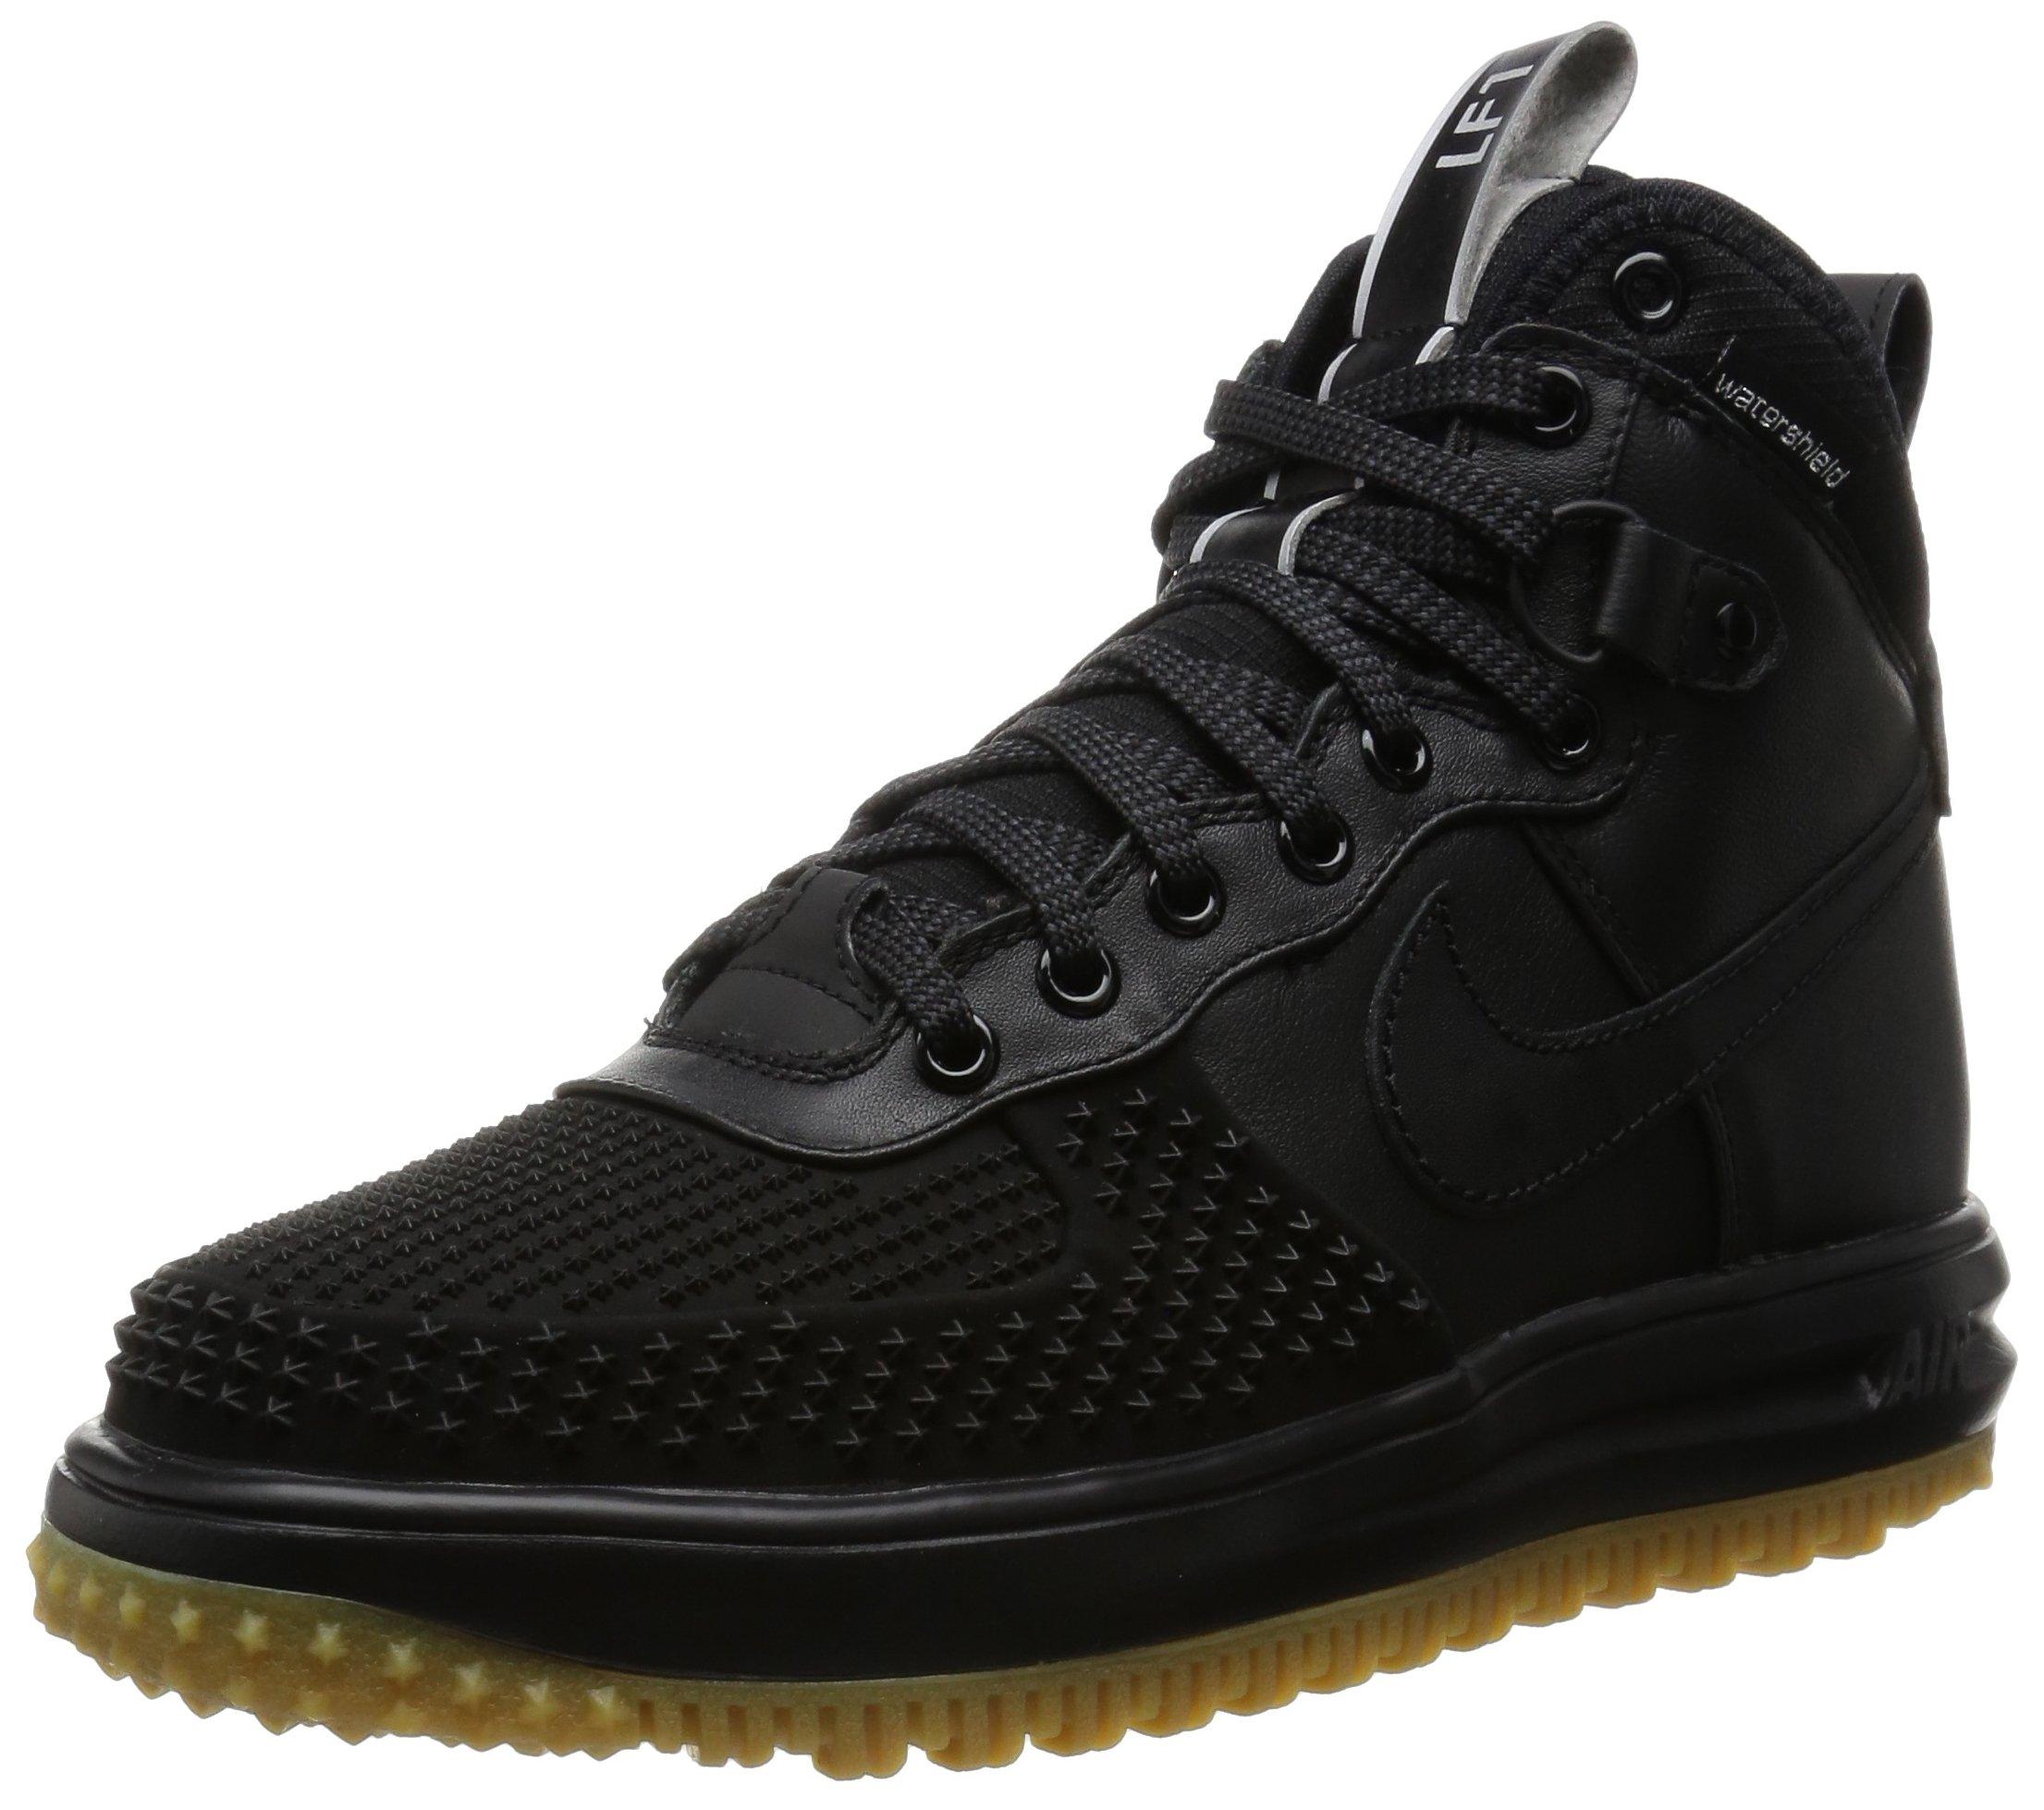 Nike Mens Lunar Force 1 Duckboot Black/Black/Metallic Silver/An Boot 8.5 Men US by NIKE